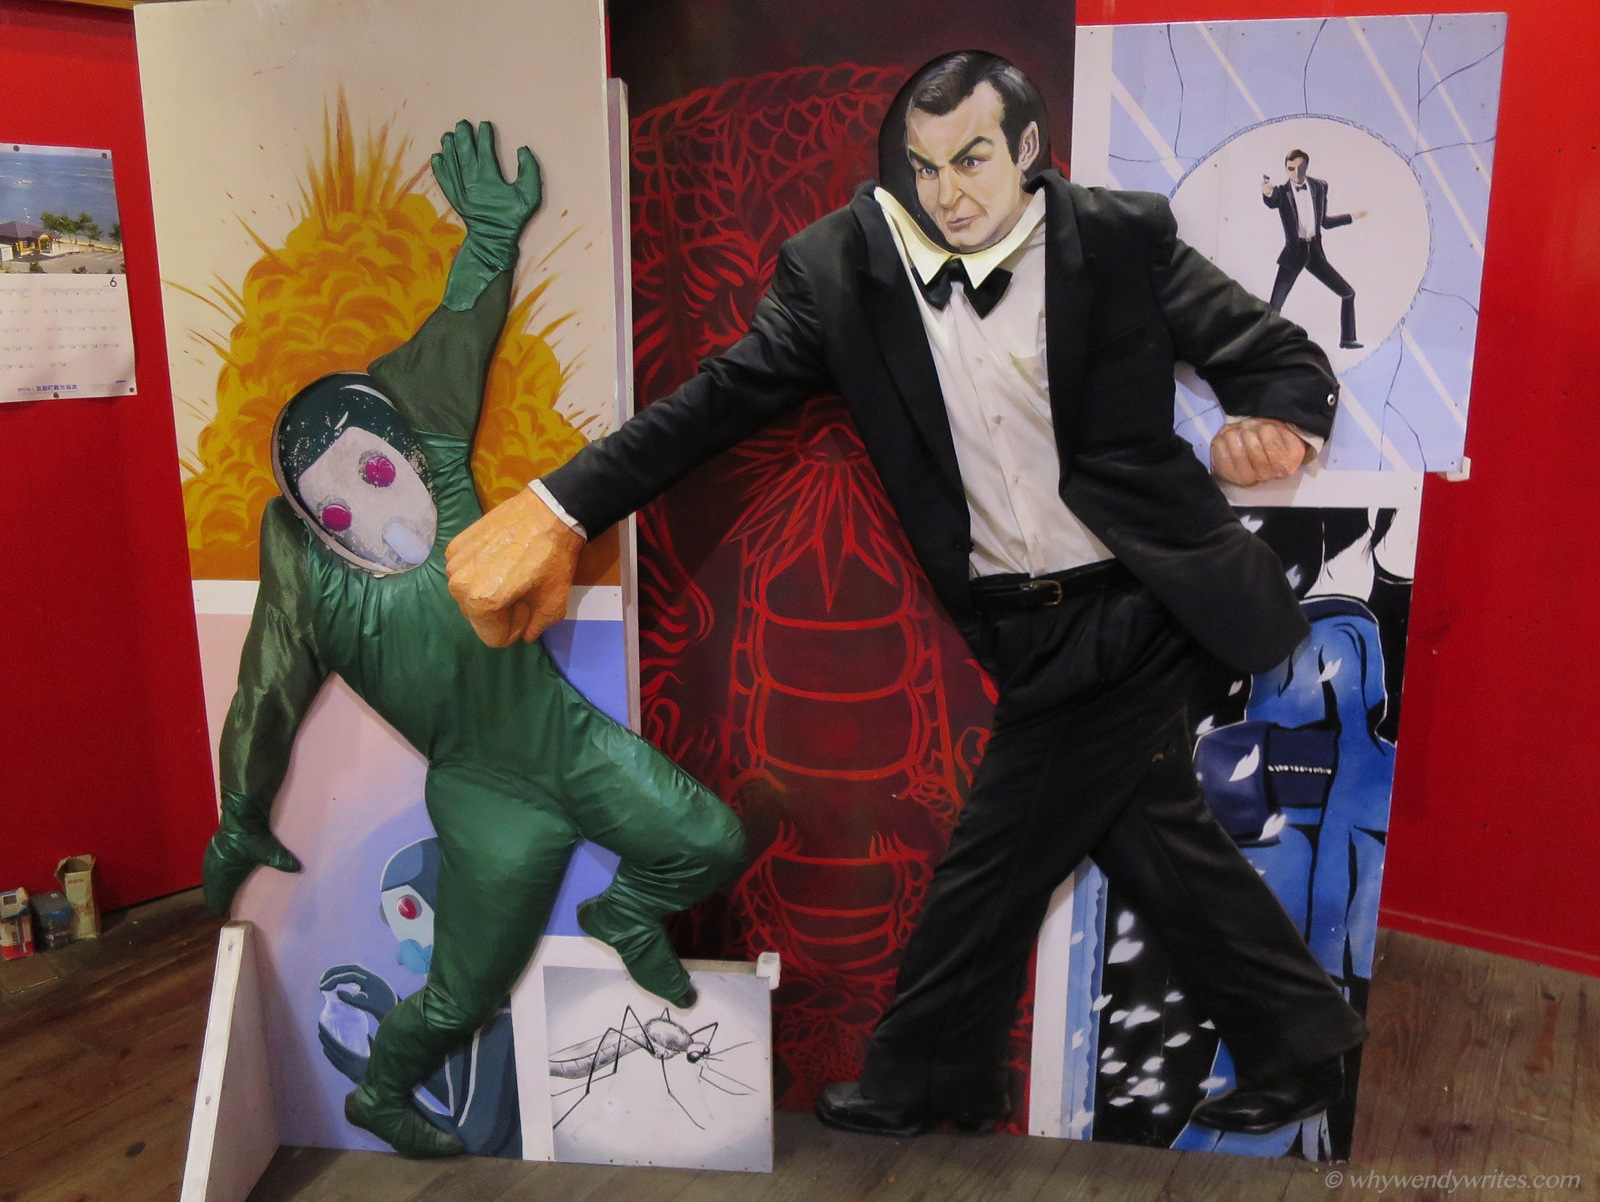 James Bond's Exhibition